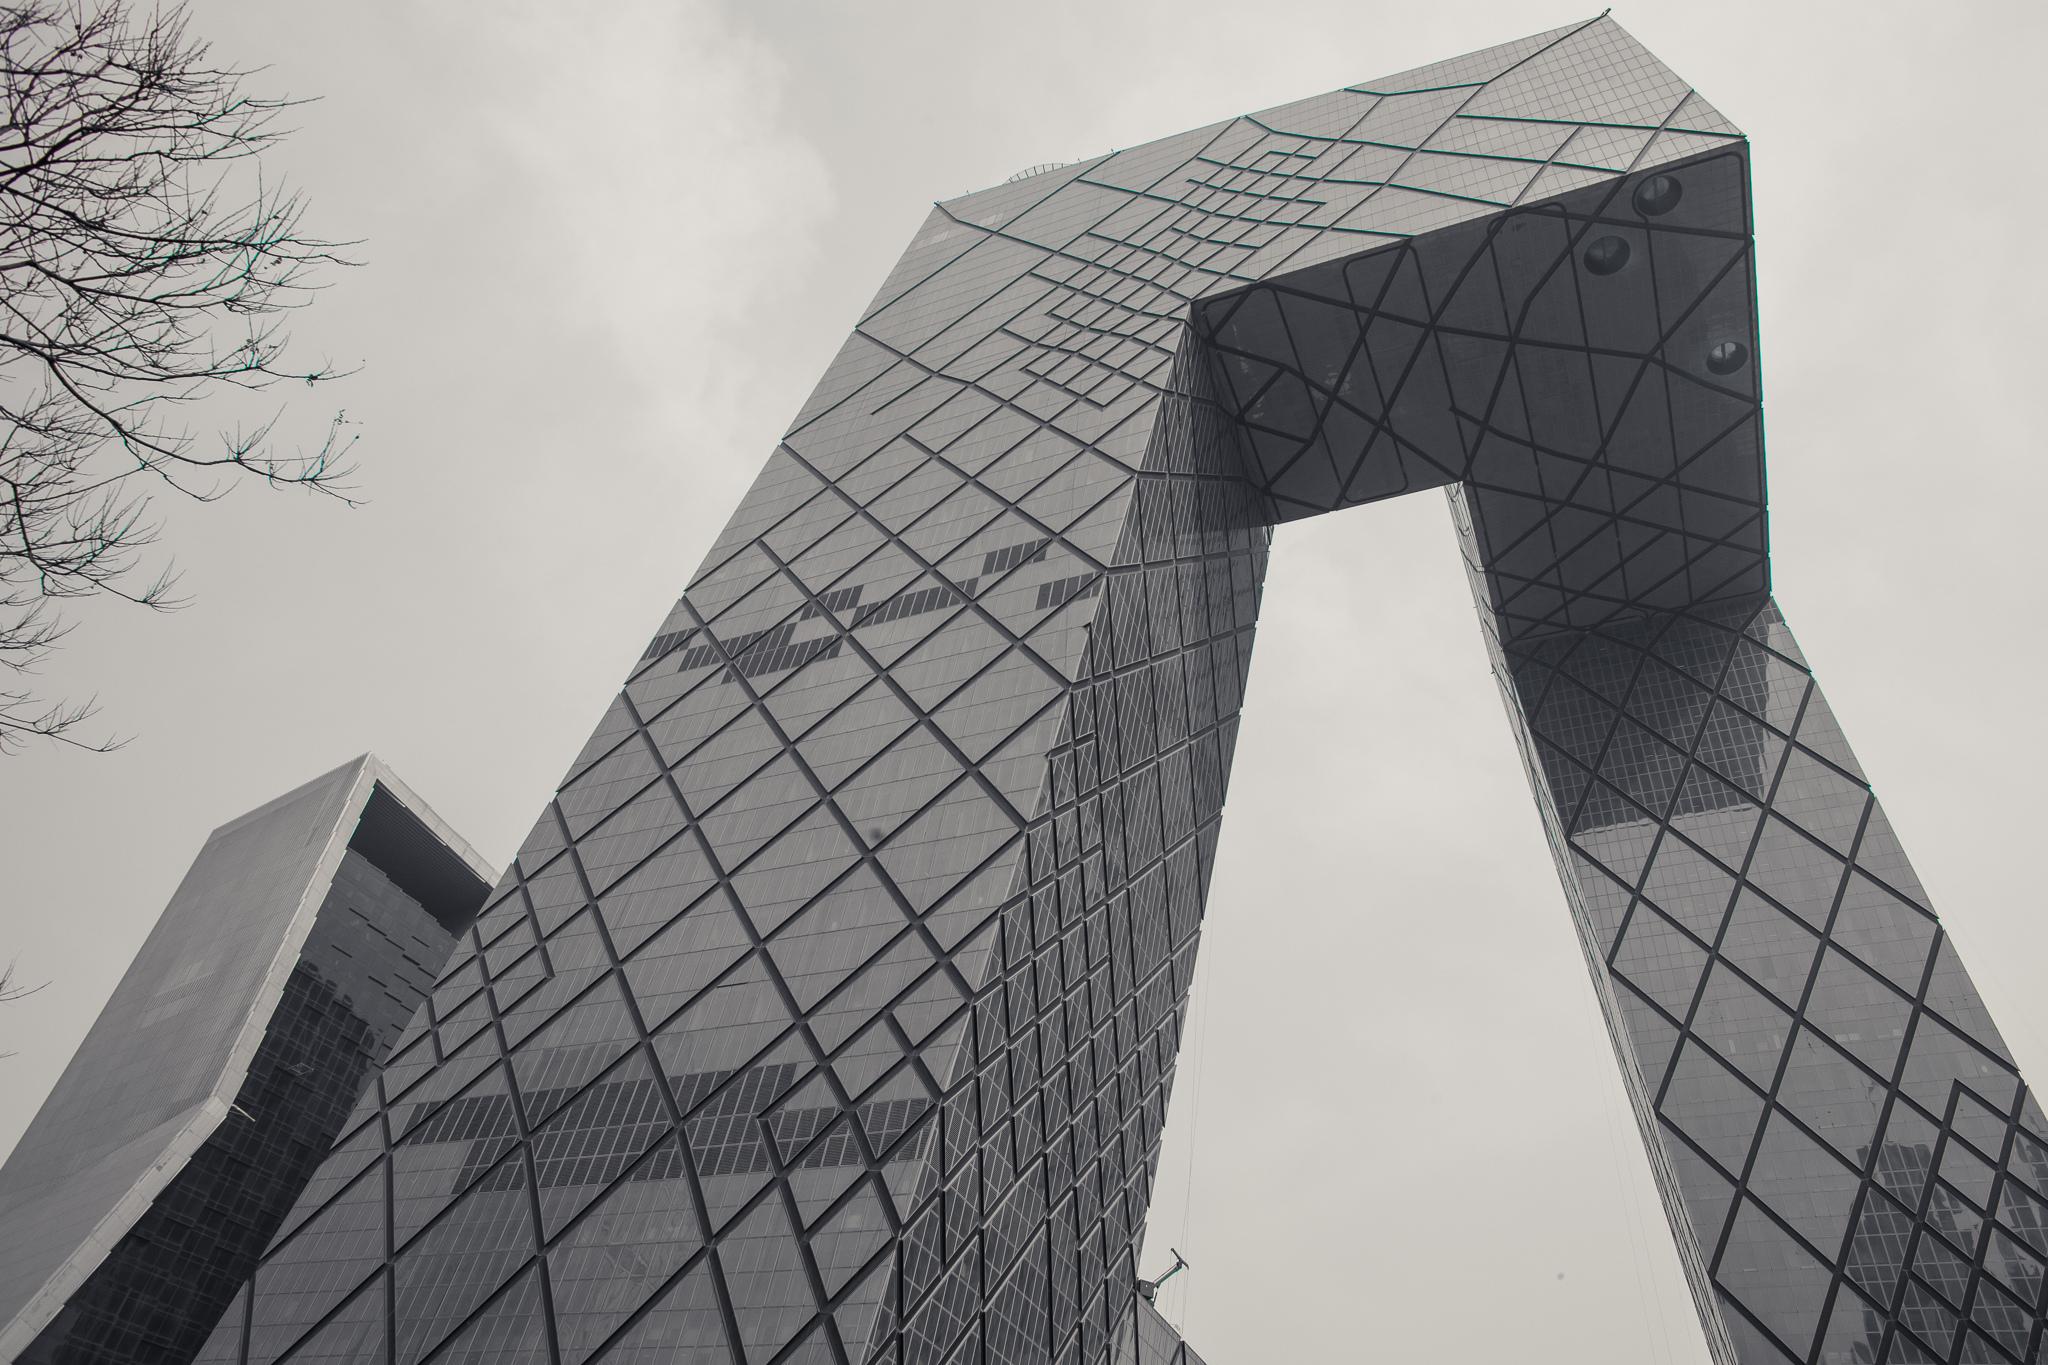 Greyjing Beijing @ CCTV Headquarters - La Dent de L'Oeil [OC][2048x1378]